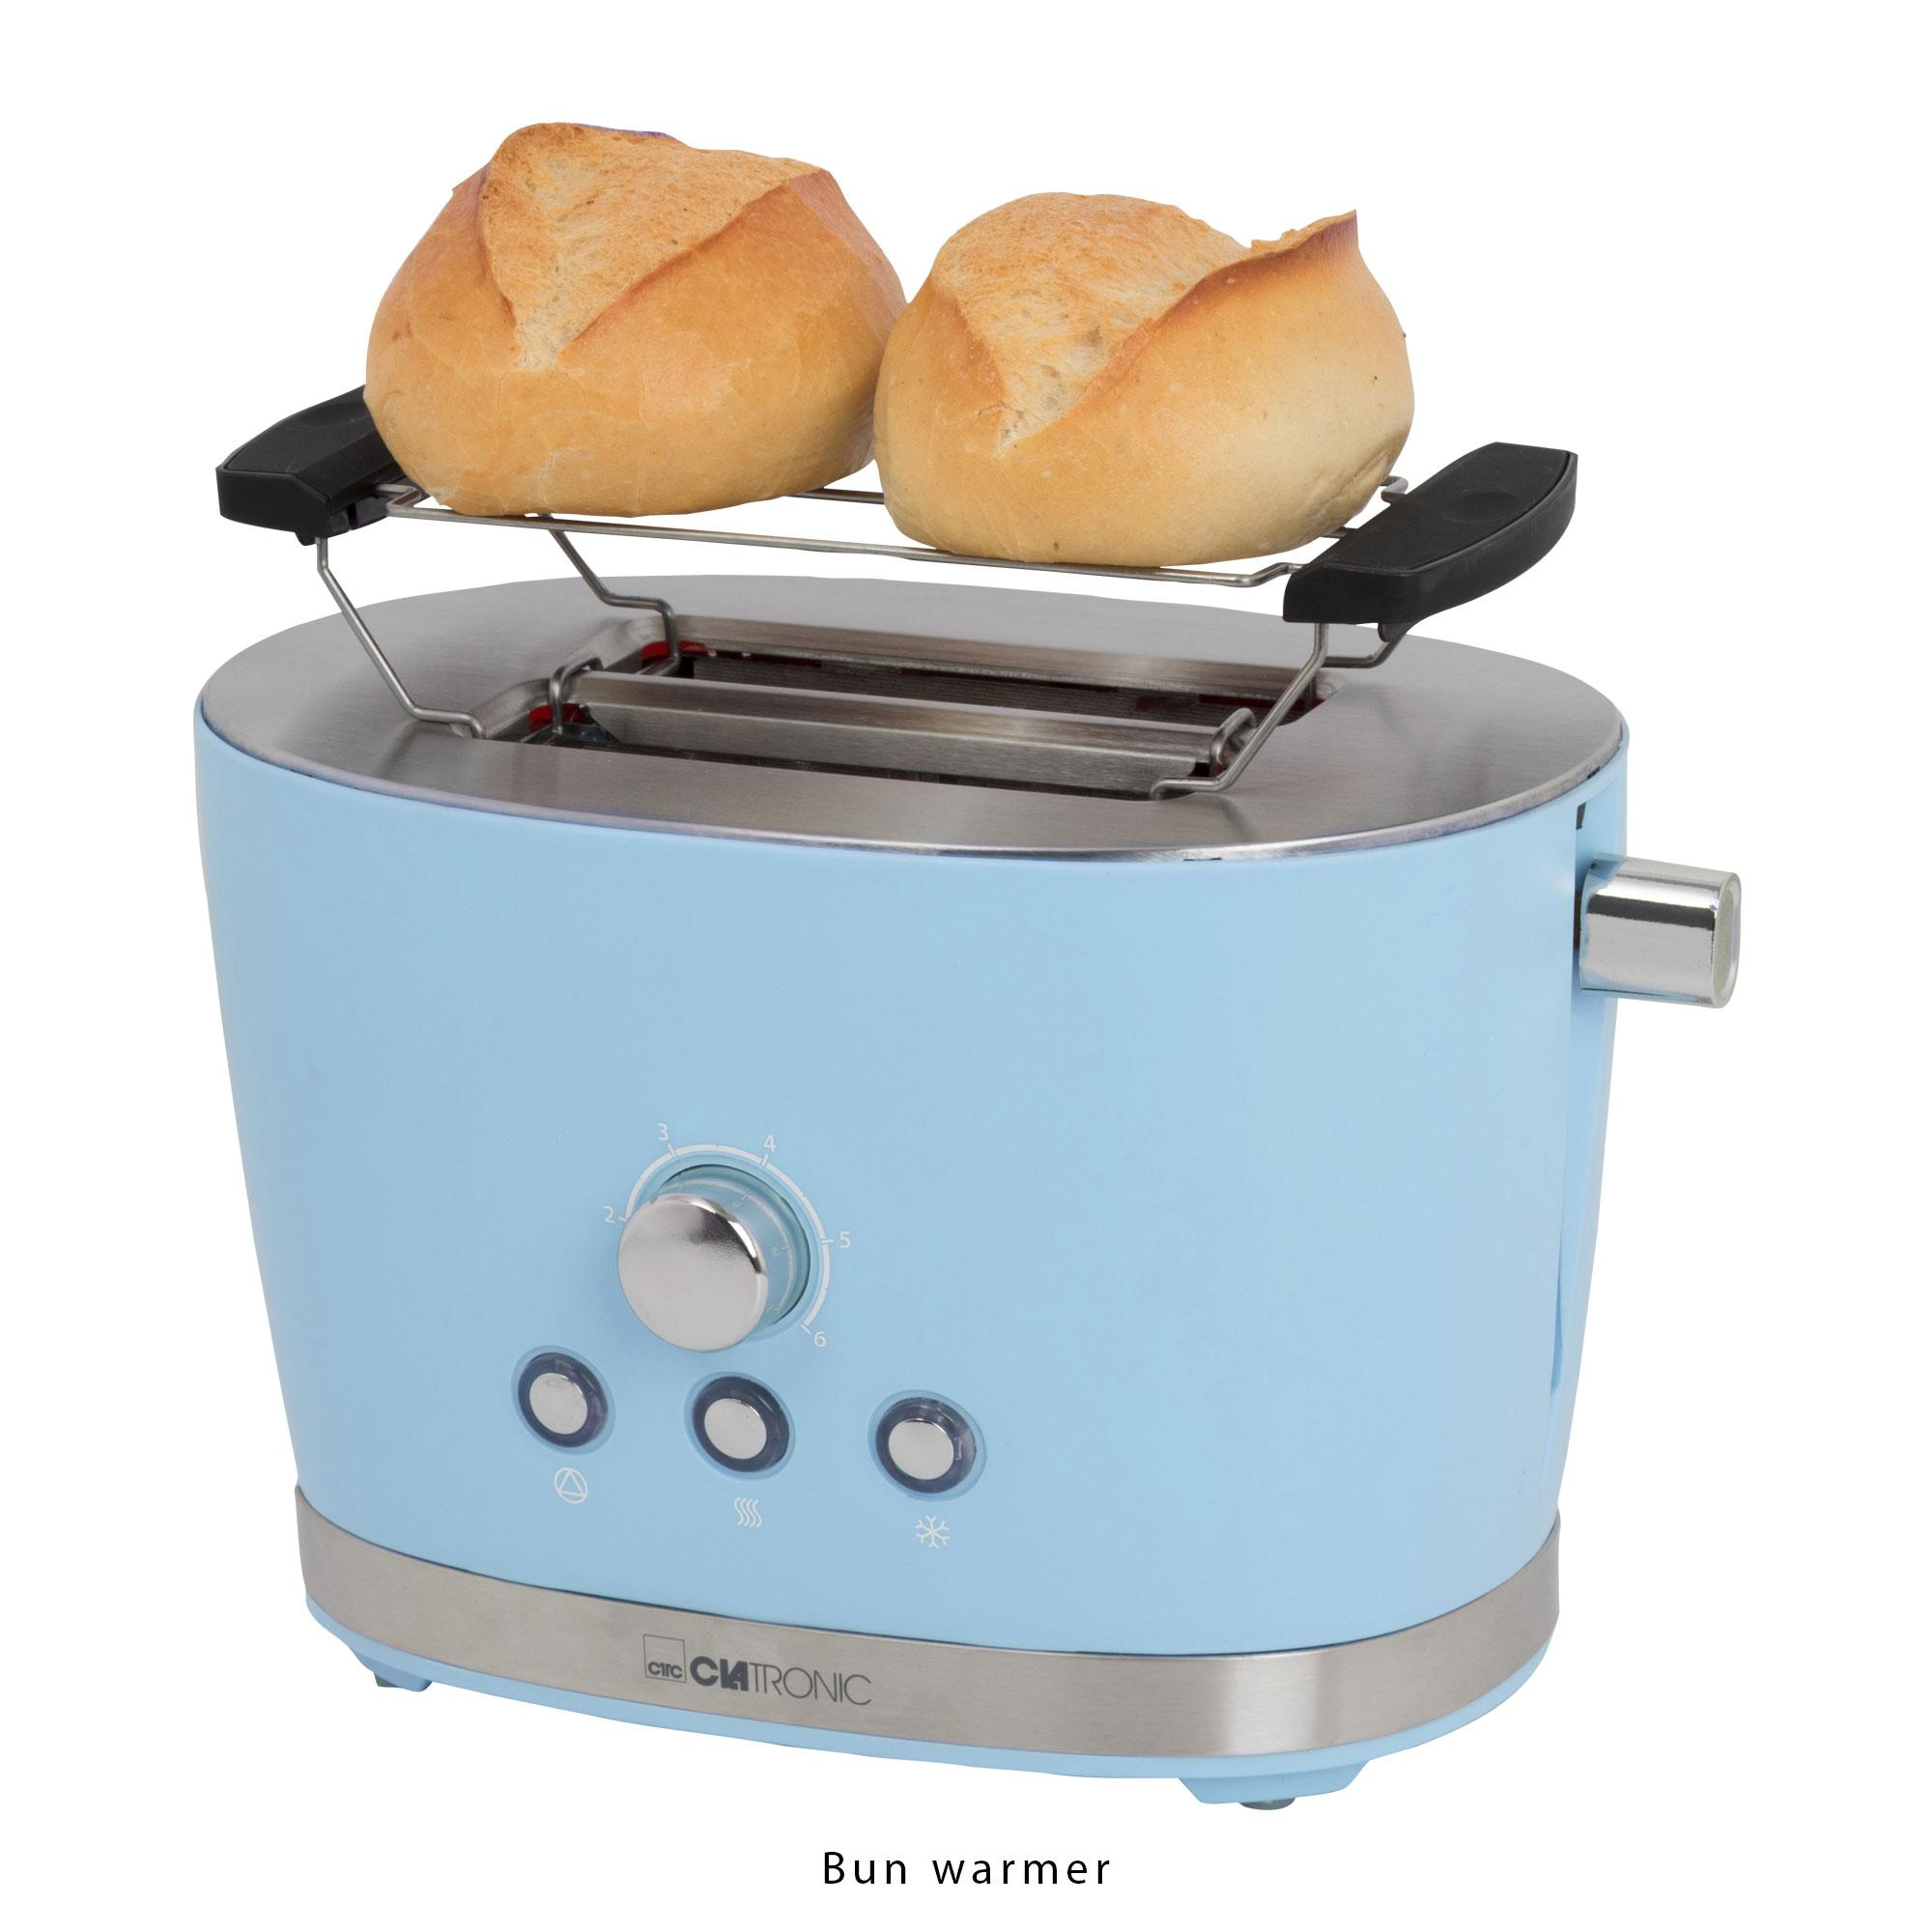 Clatronic TA 3690 Tostadora de Pan, 2 Ranuras, 3 Funciones, tostar, Calentar y descongelar, 850 W, regulador de Nivel de Tostado, calienta panecillos ...